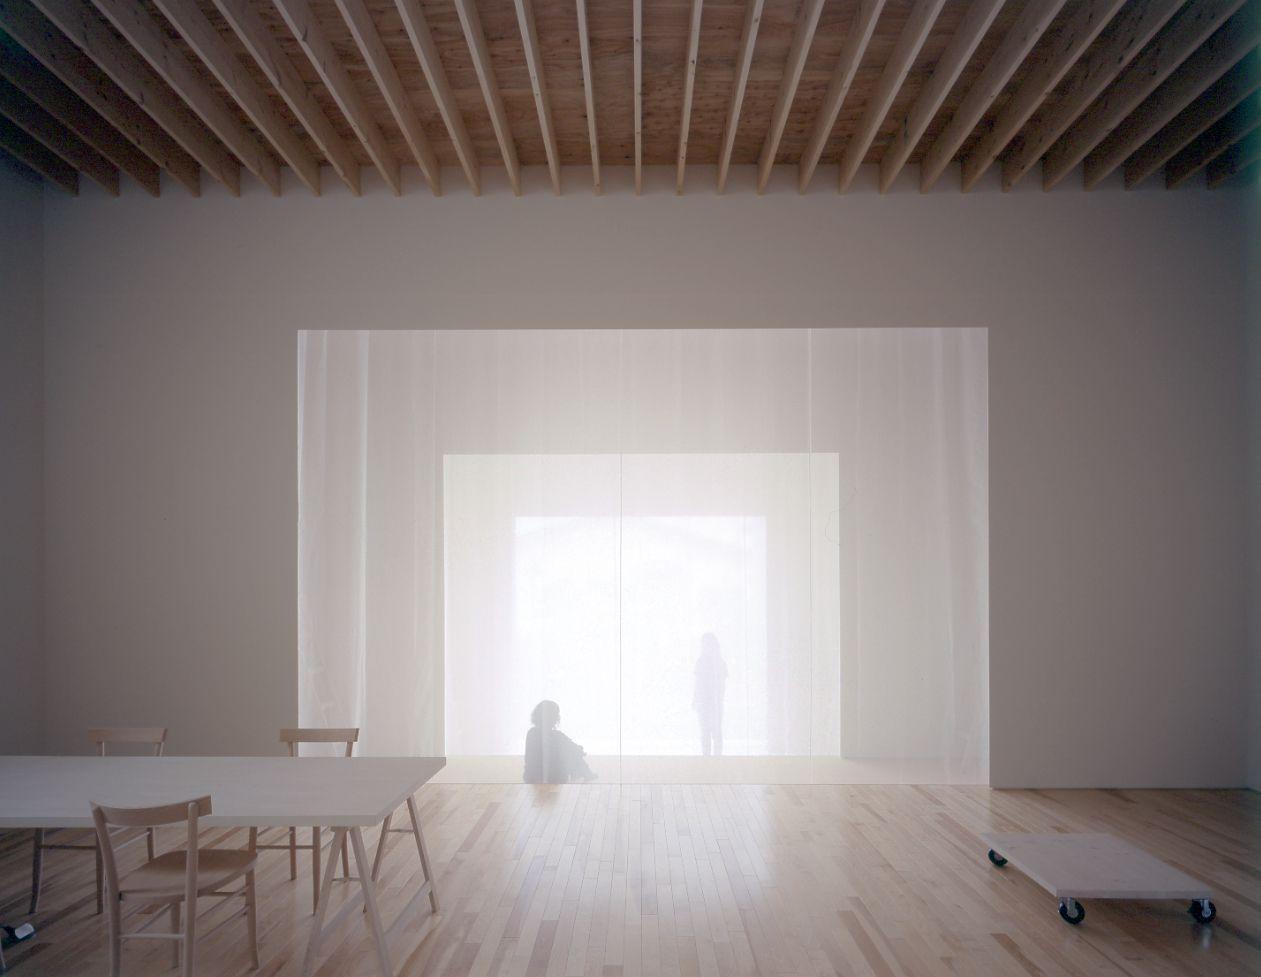 Layered House by Jun Igarashi Architects in Hokkaido, Japan